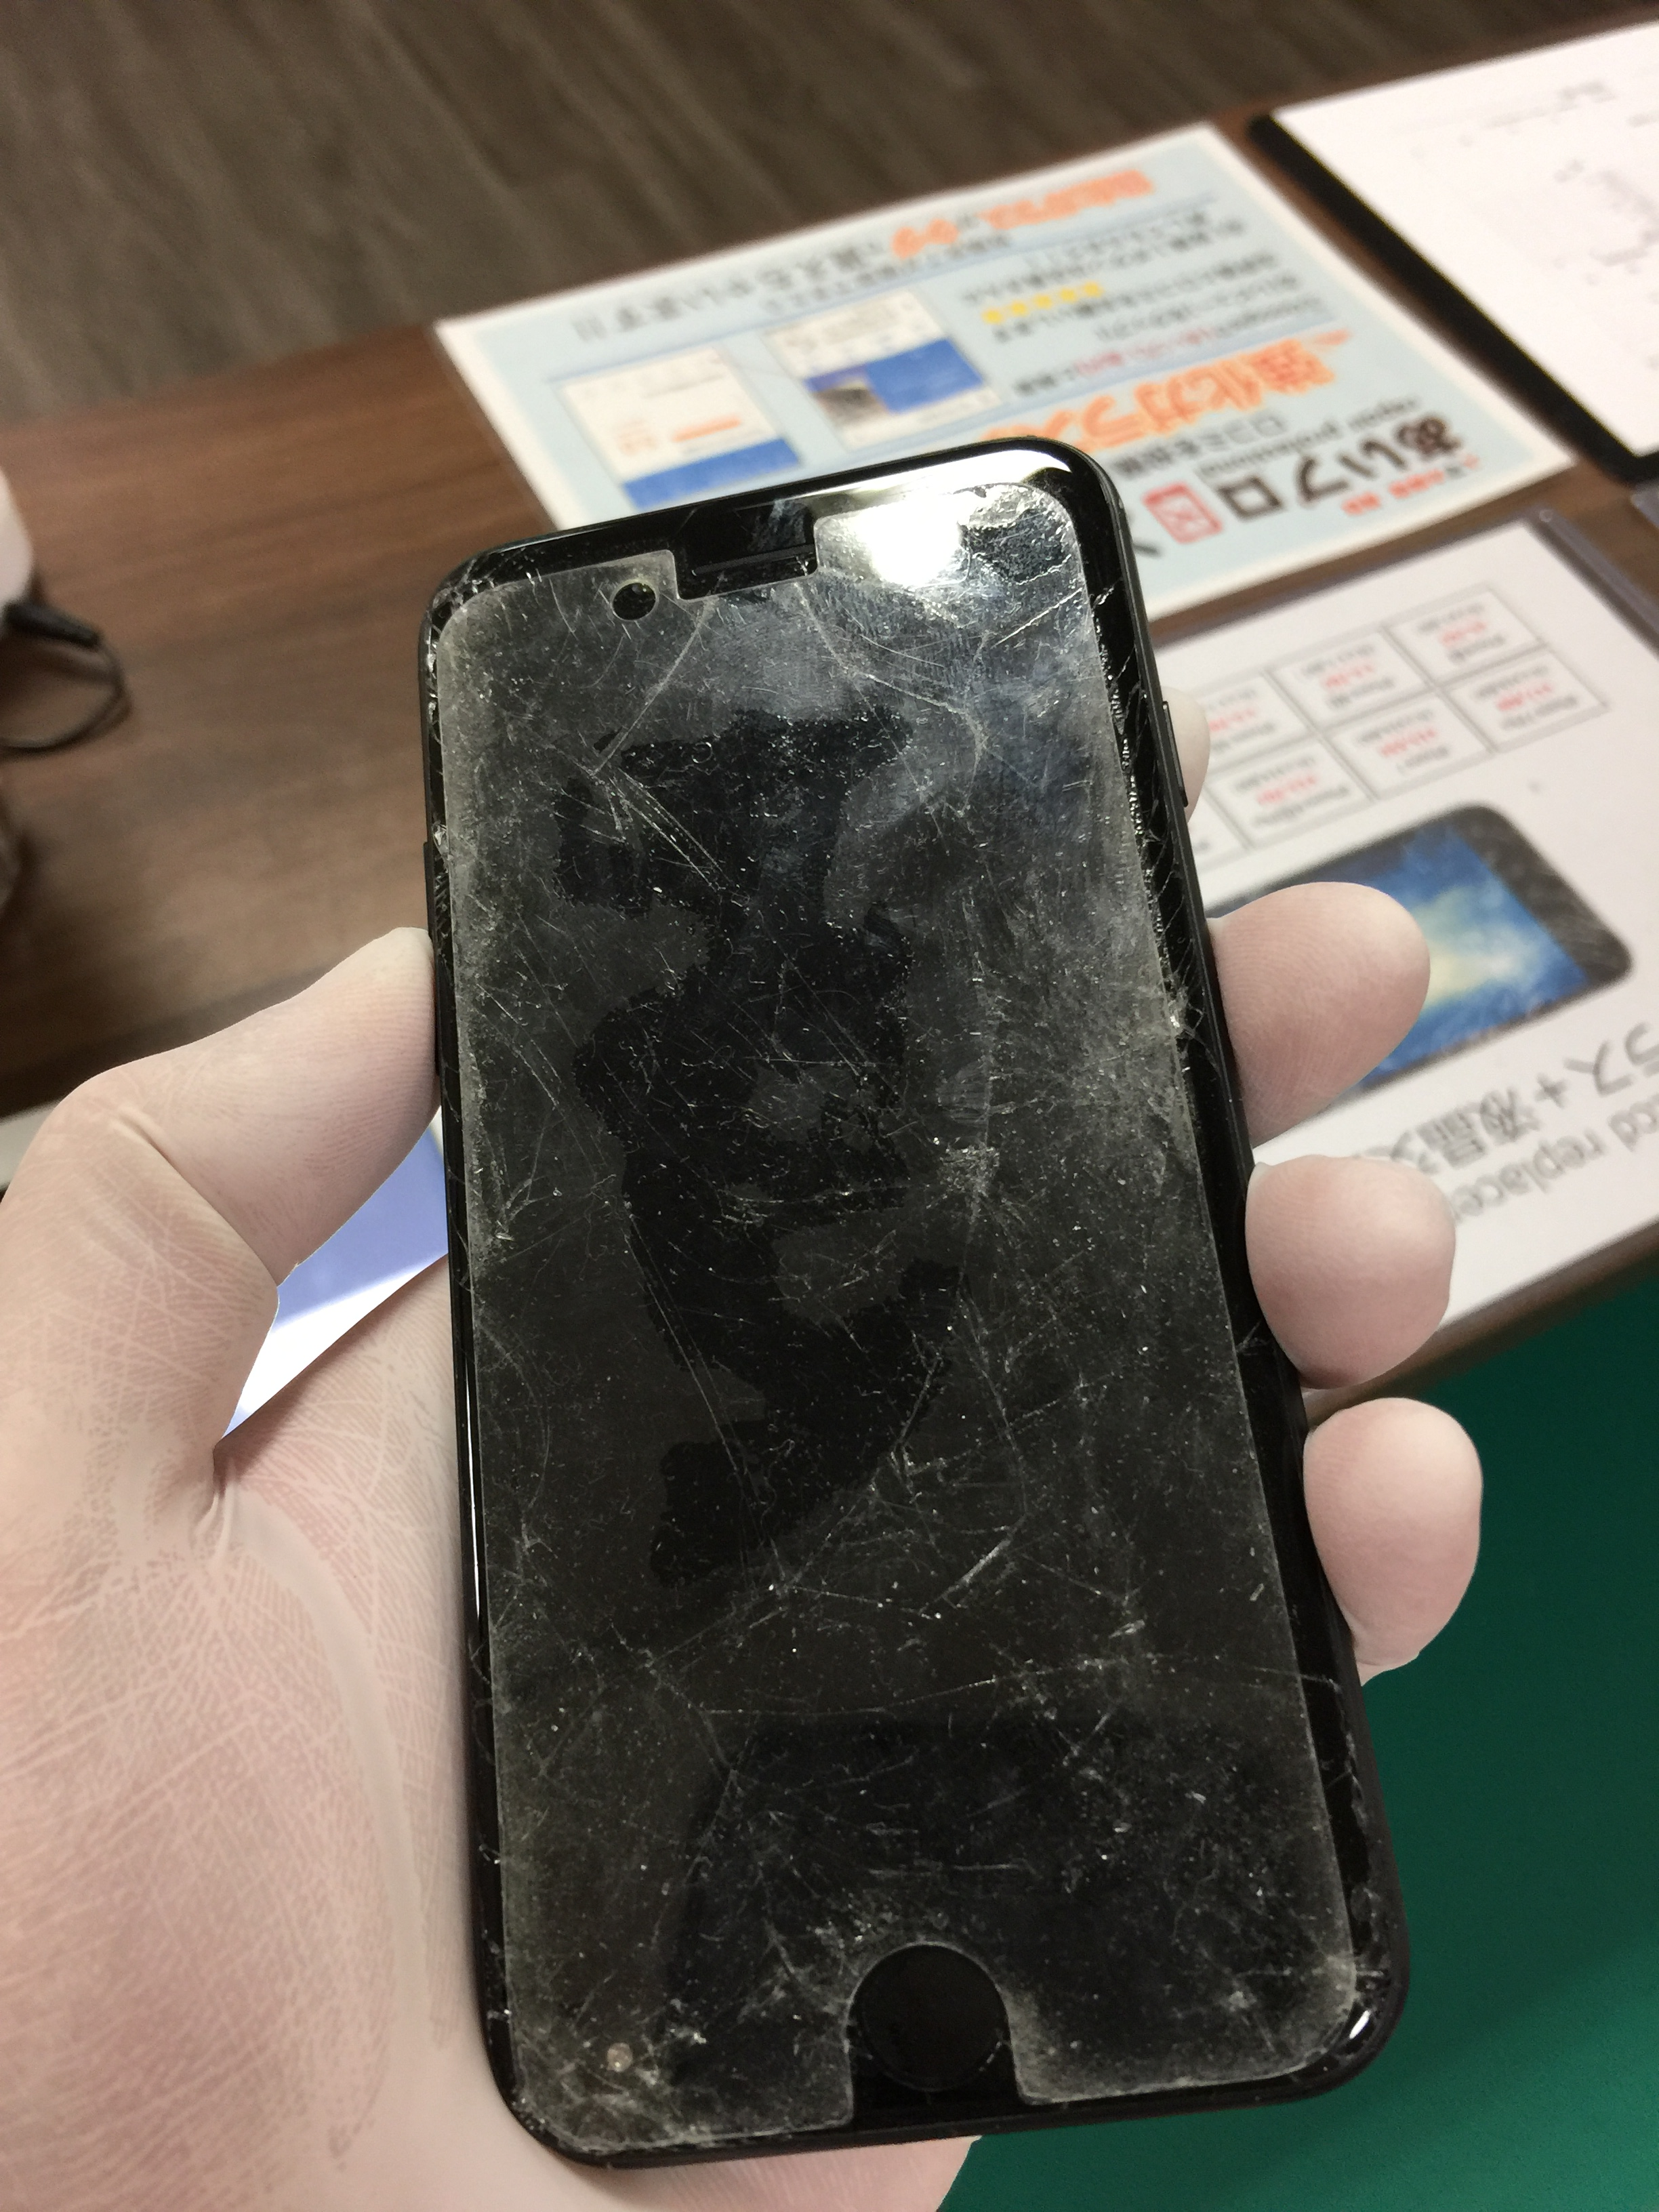 【iPhone6s 修理 山梨市】バッテリー快適にしませんか?あいプロ ...